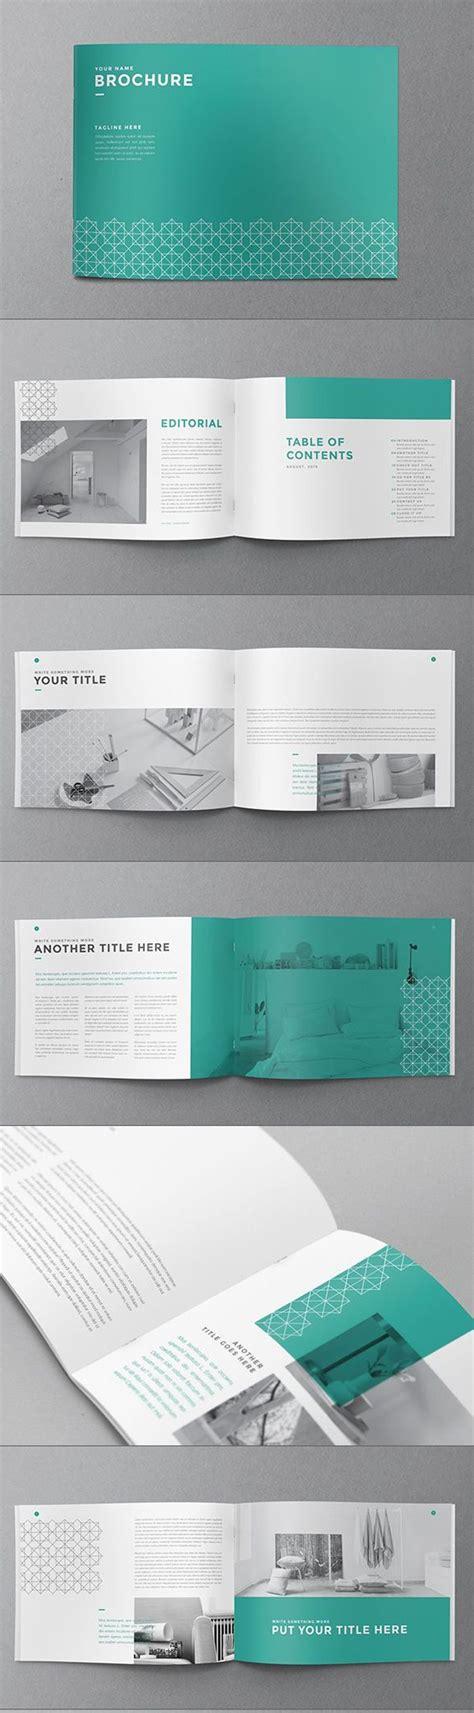 brochure design designspiration brochure design のおすすめ画像 312 件 pinterest チラシ カタログ チラシの